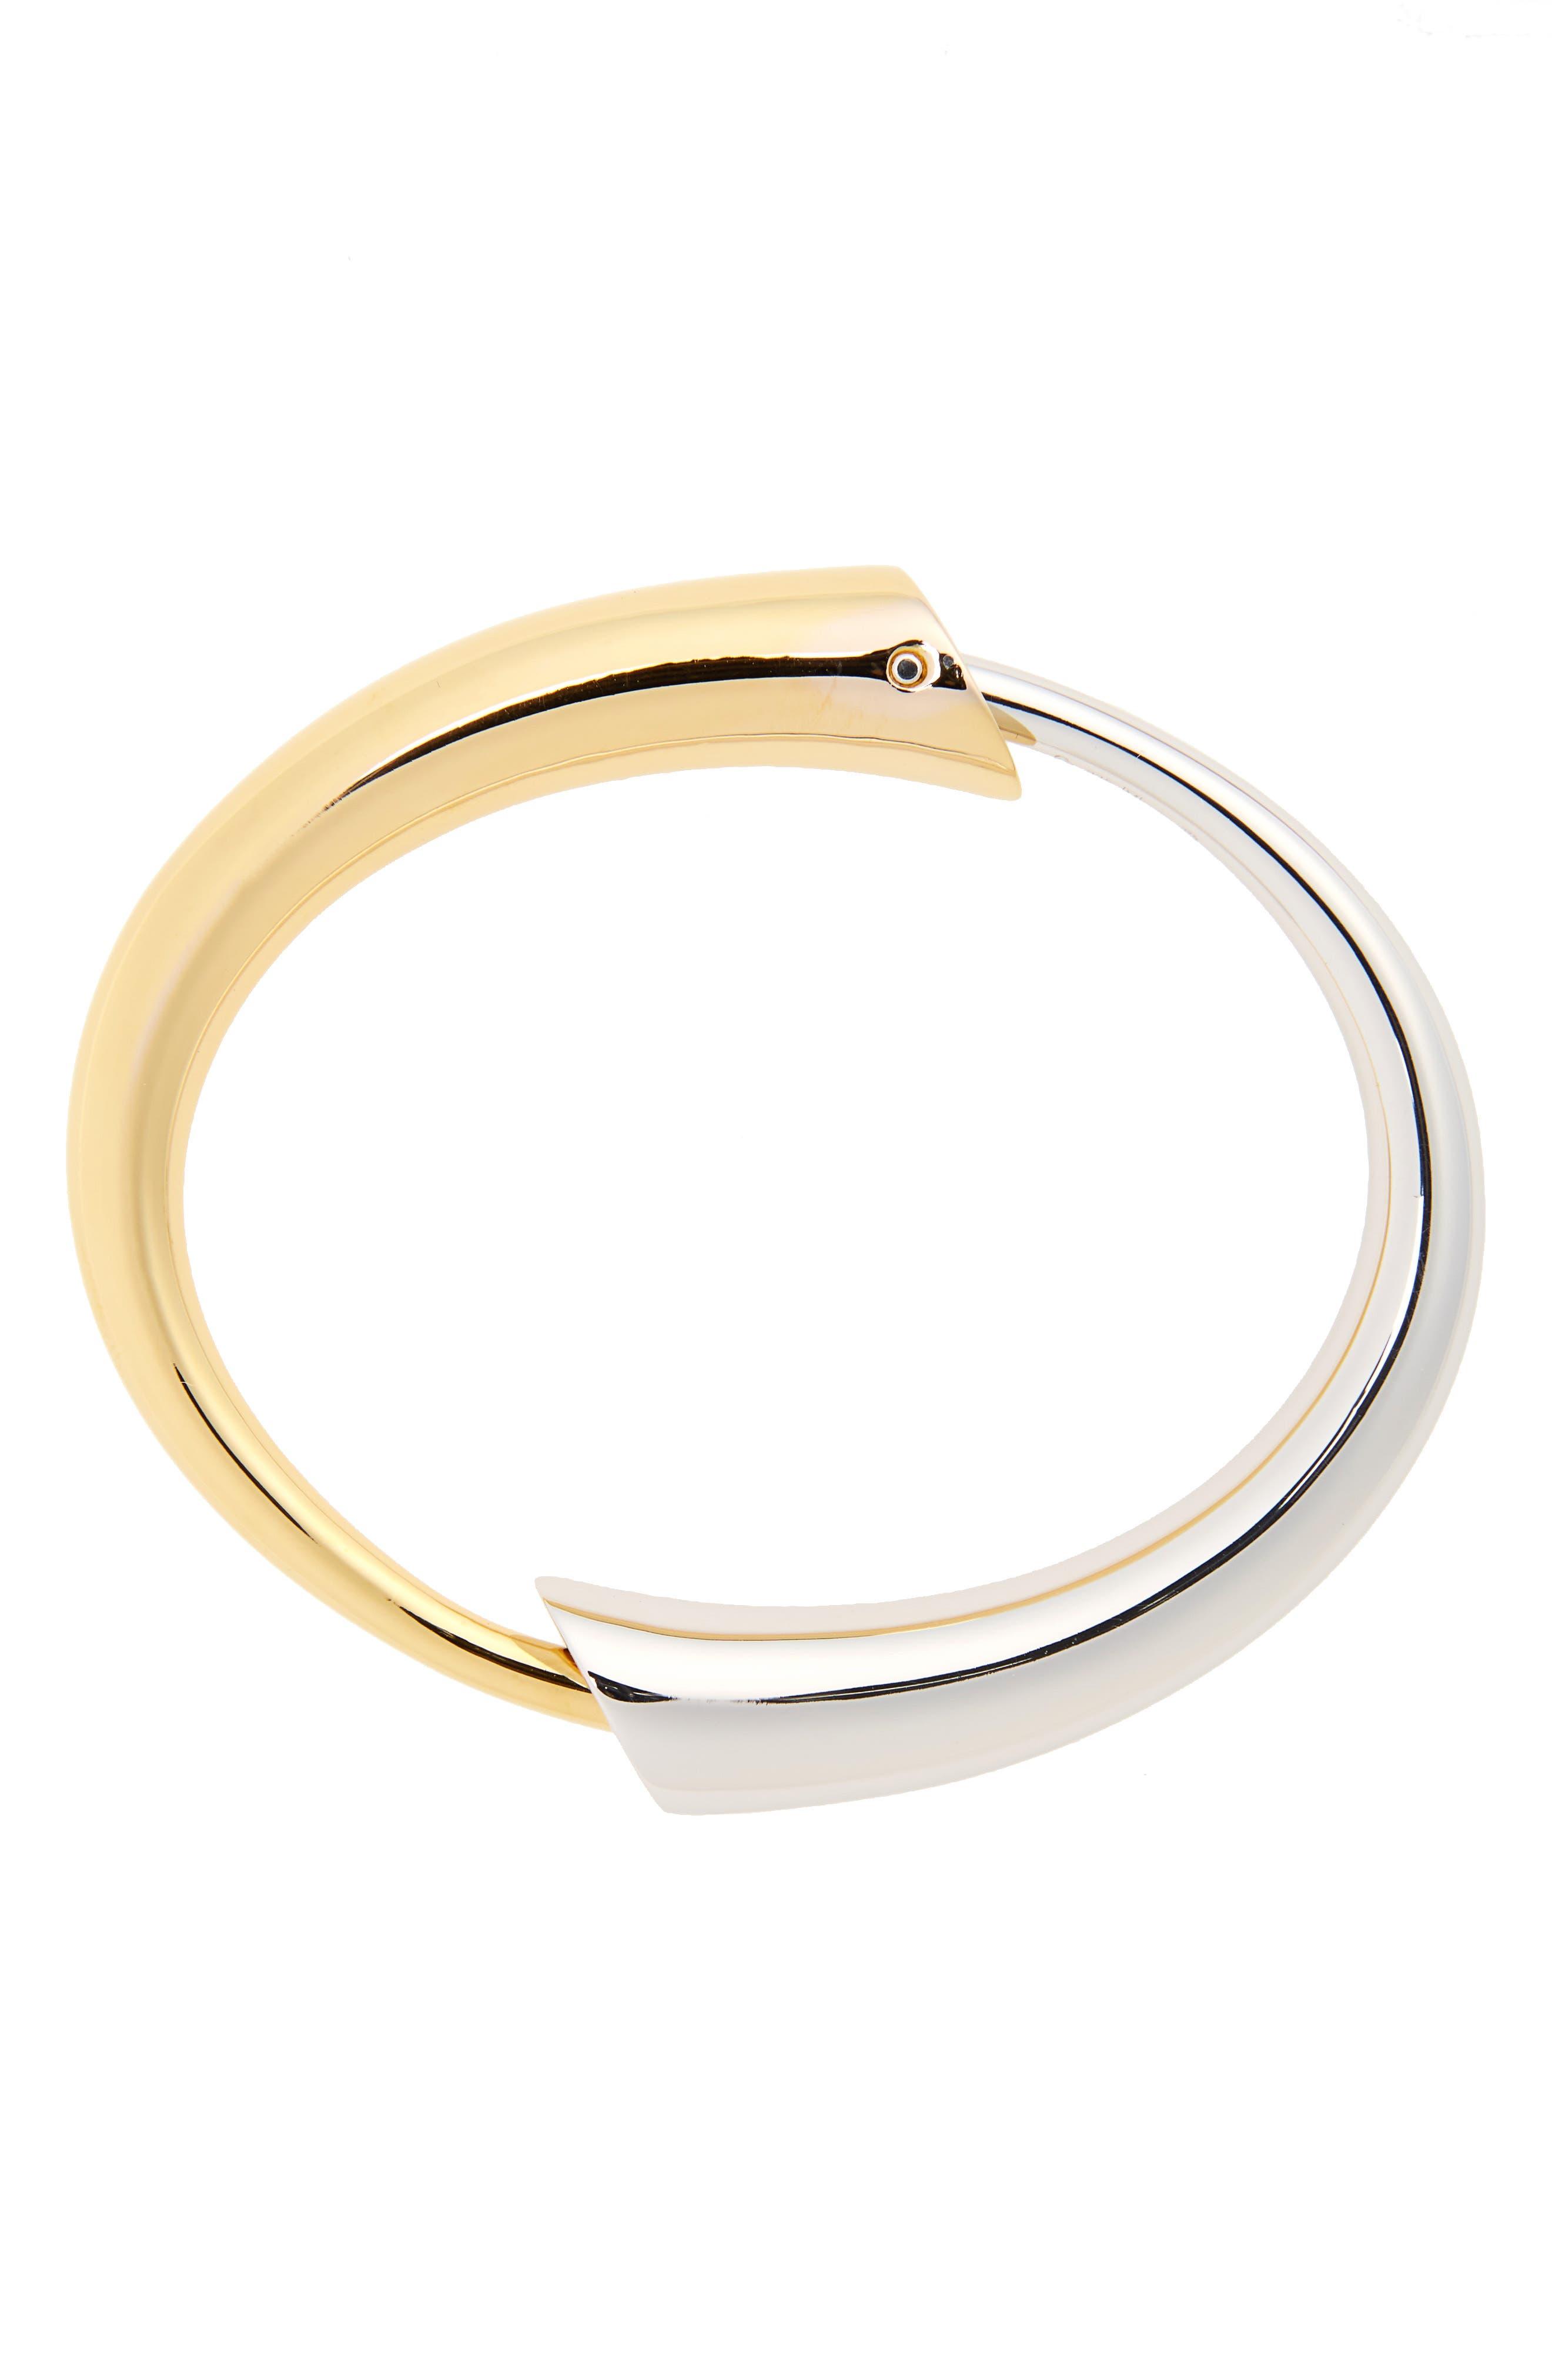 Gia Bracelet,                             Main thumbnail 1, color,                             Yellow/Vermeil/Silver